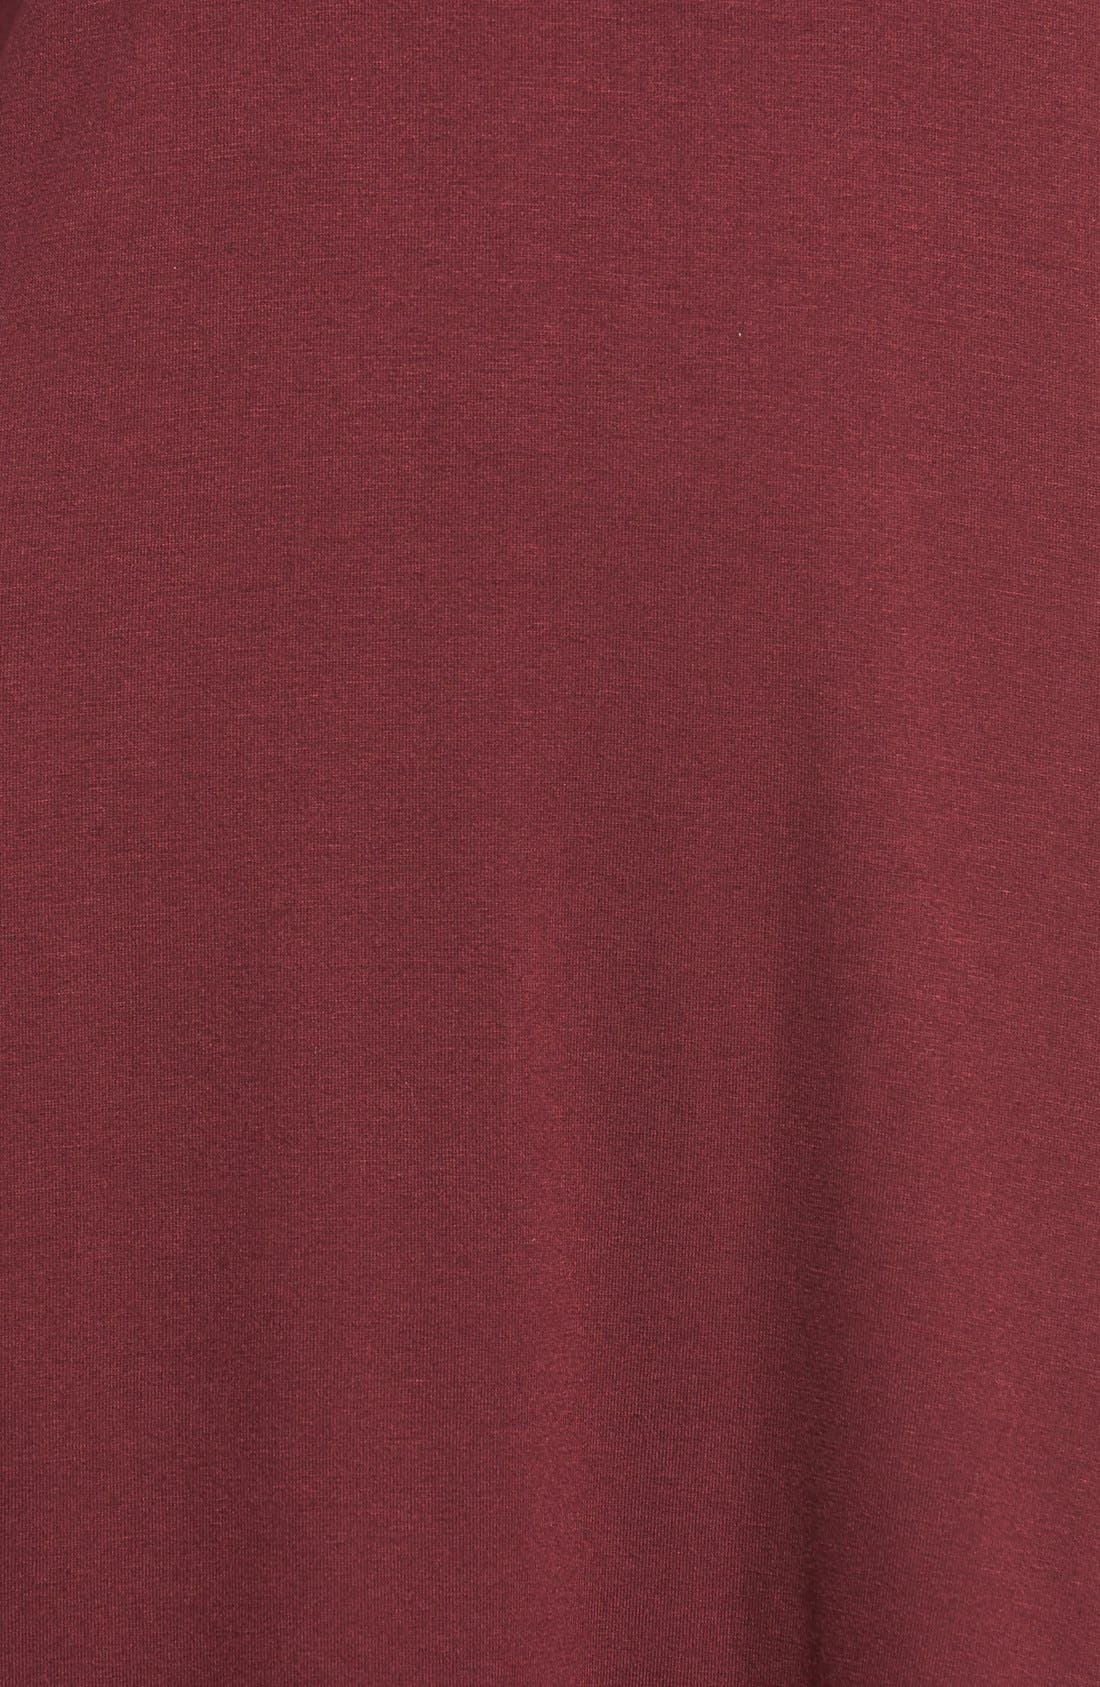 Cowl Neck Shift Dress,                             Alternate thumbnail 27, color,